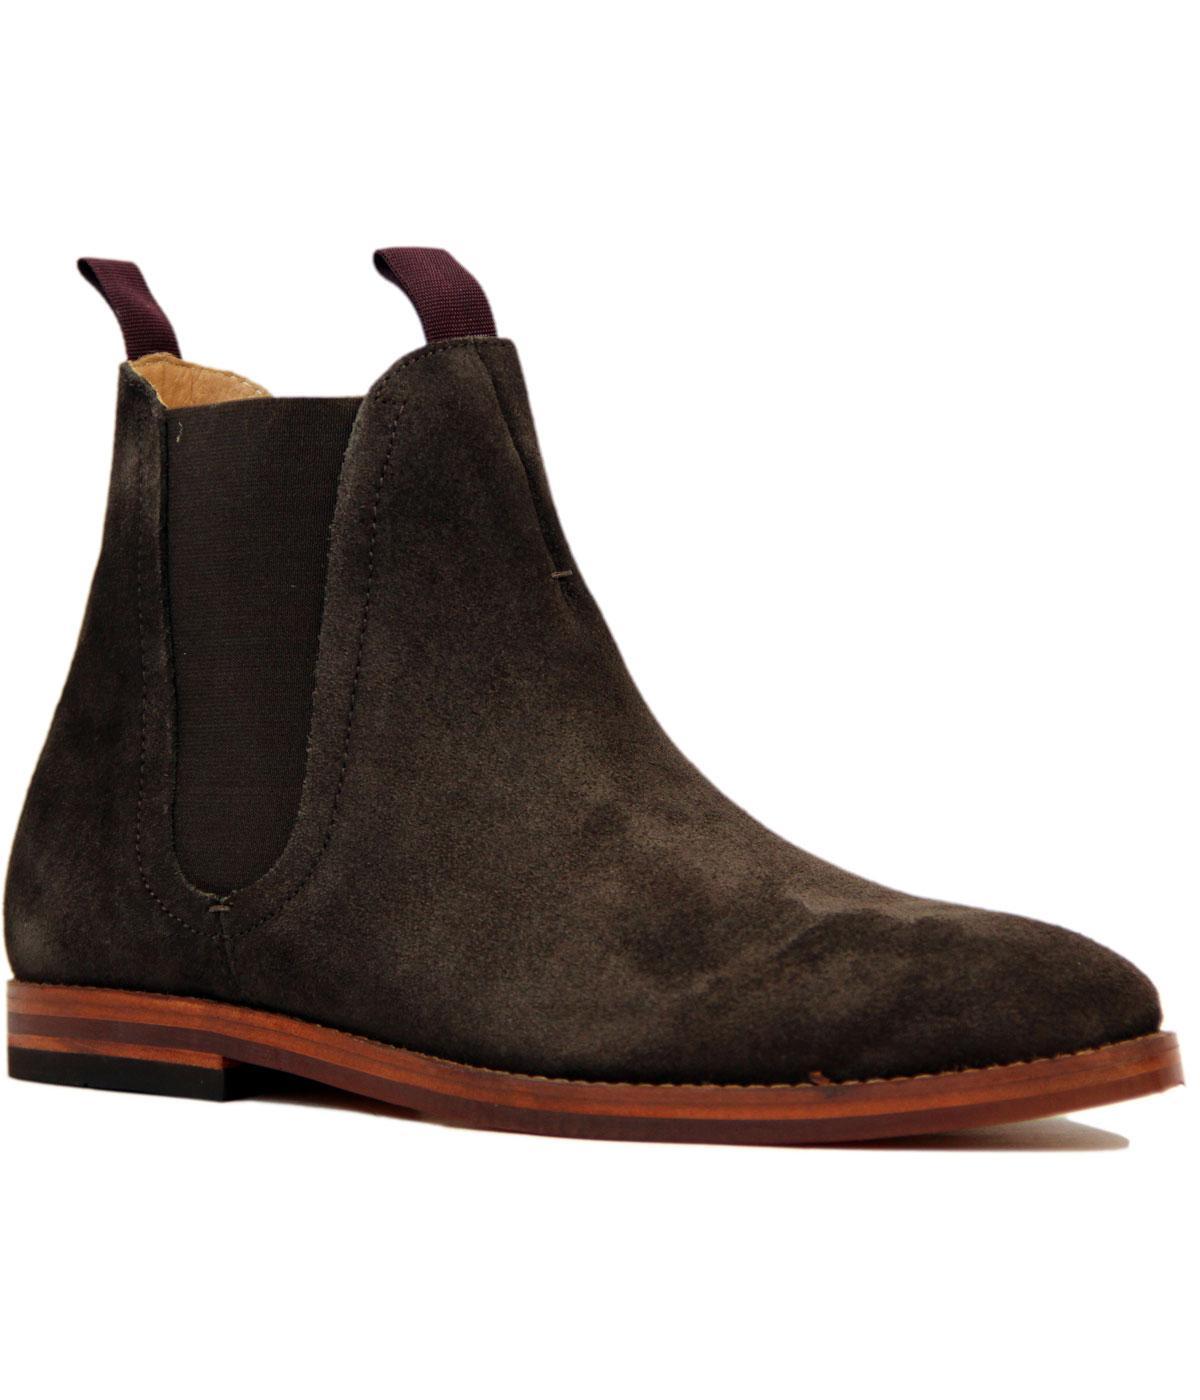 h by hudson tamper retro mod suede chelsea boots in brown. Black Bedroom Furniture Sets. Home Design Ideas